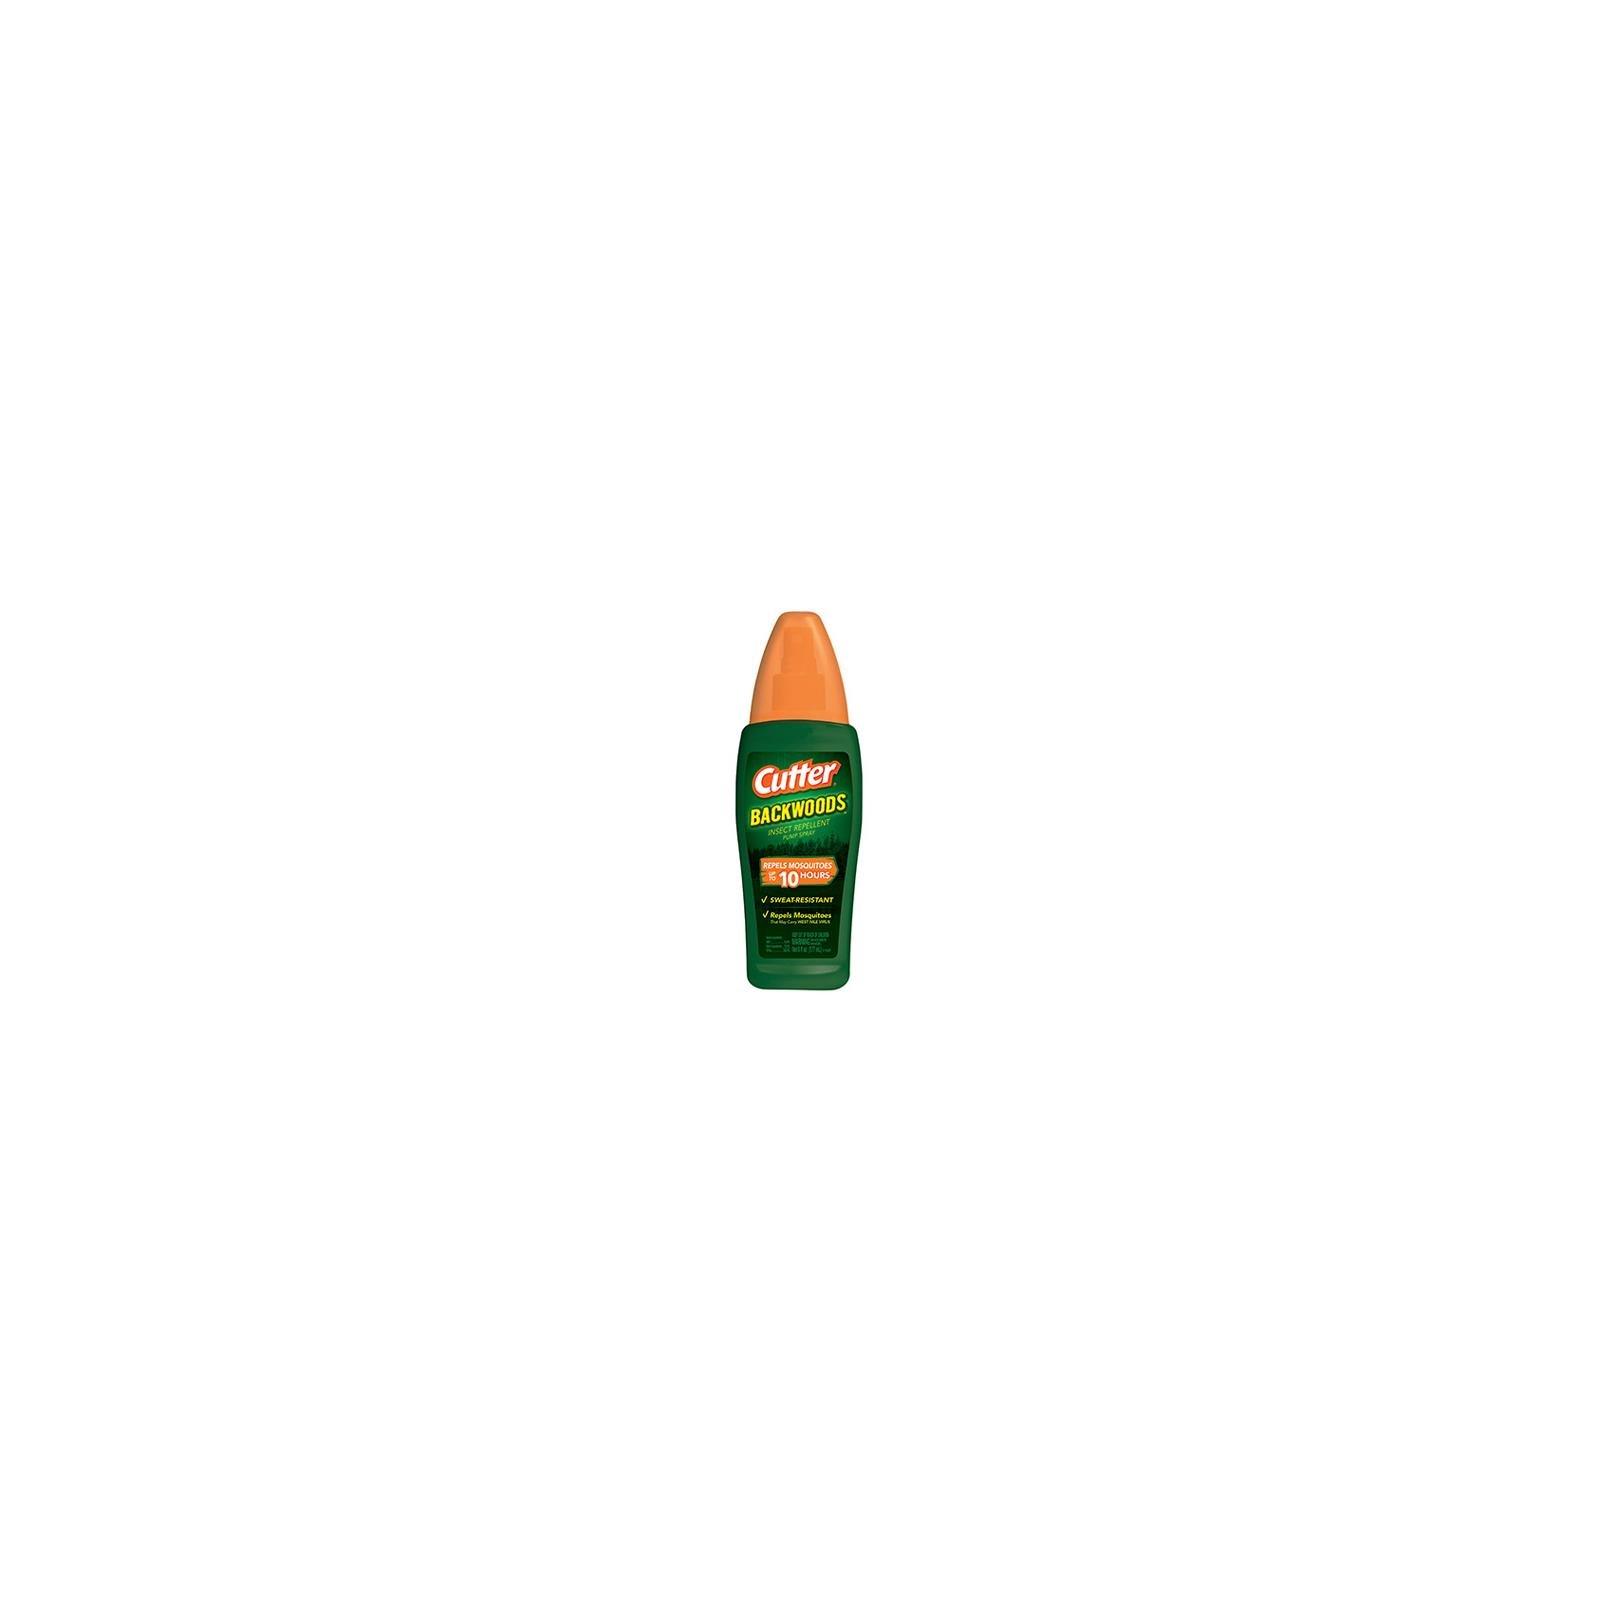 Spectrum Brands Pet Home & Garden HG-96284 Backwoods Insect Repellent Pump Spray, 6-oz. - Quantity 12